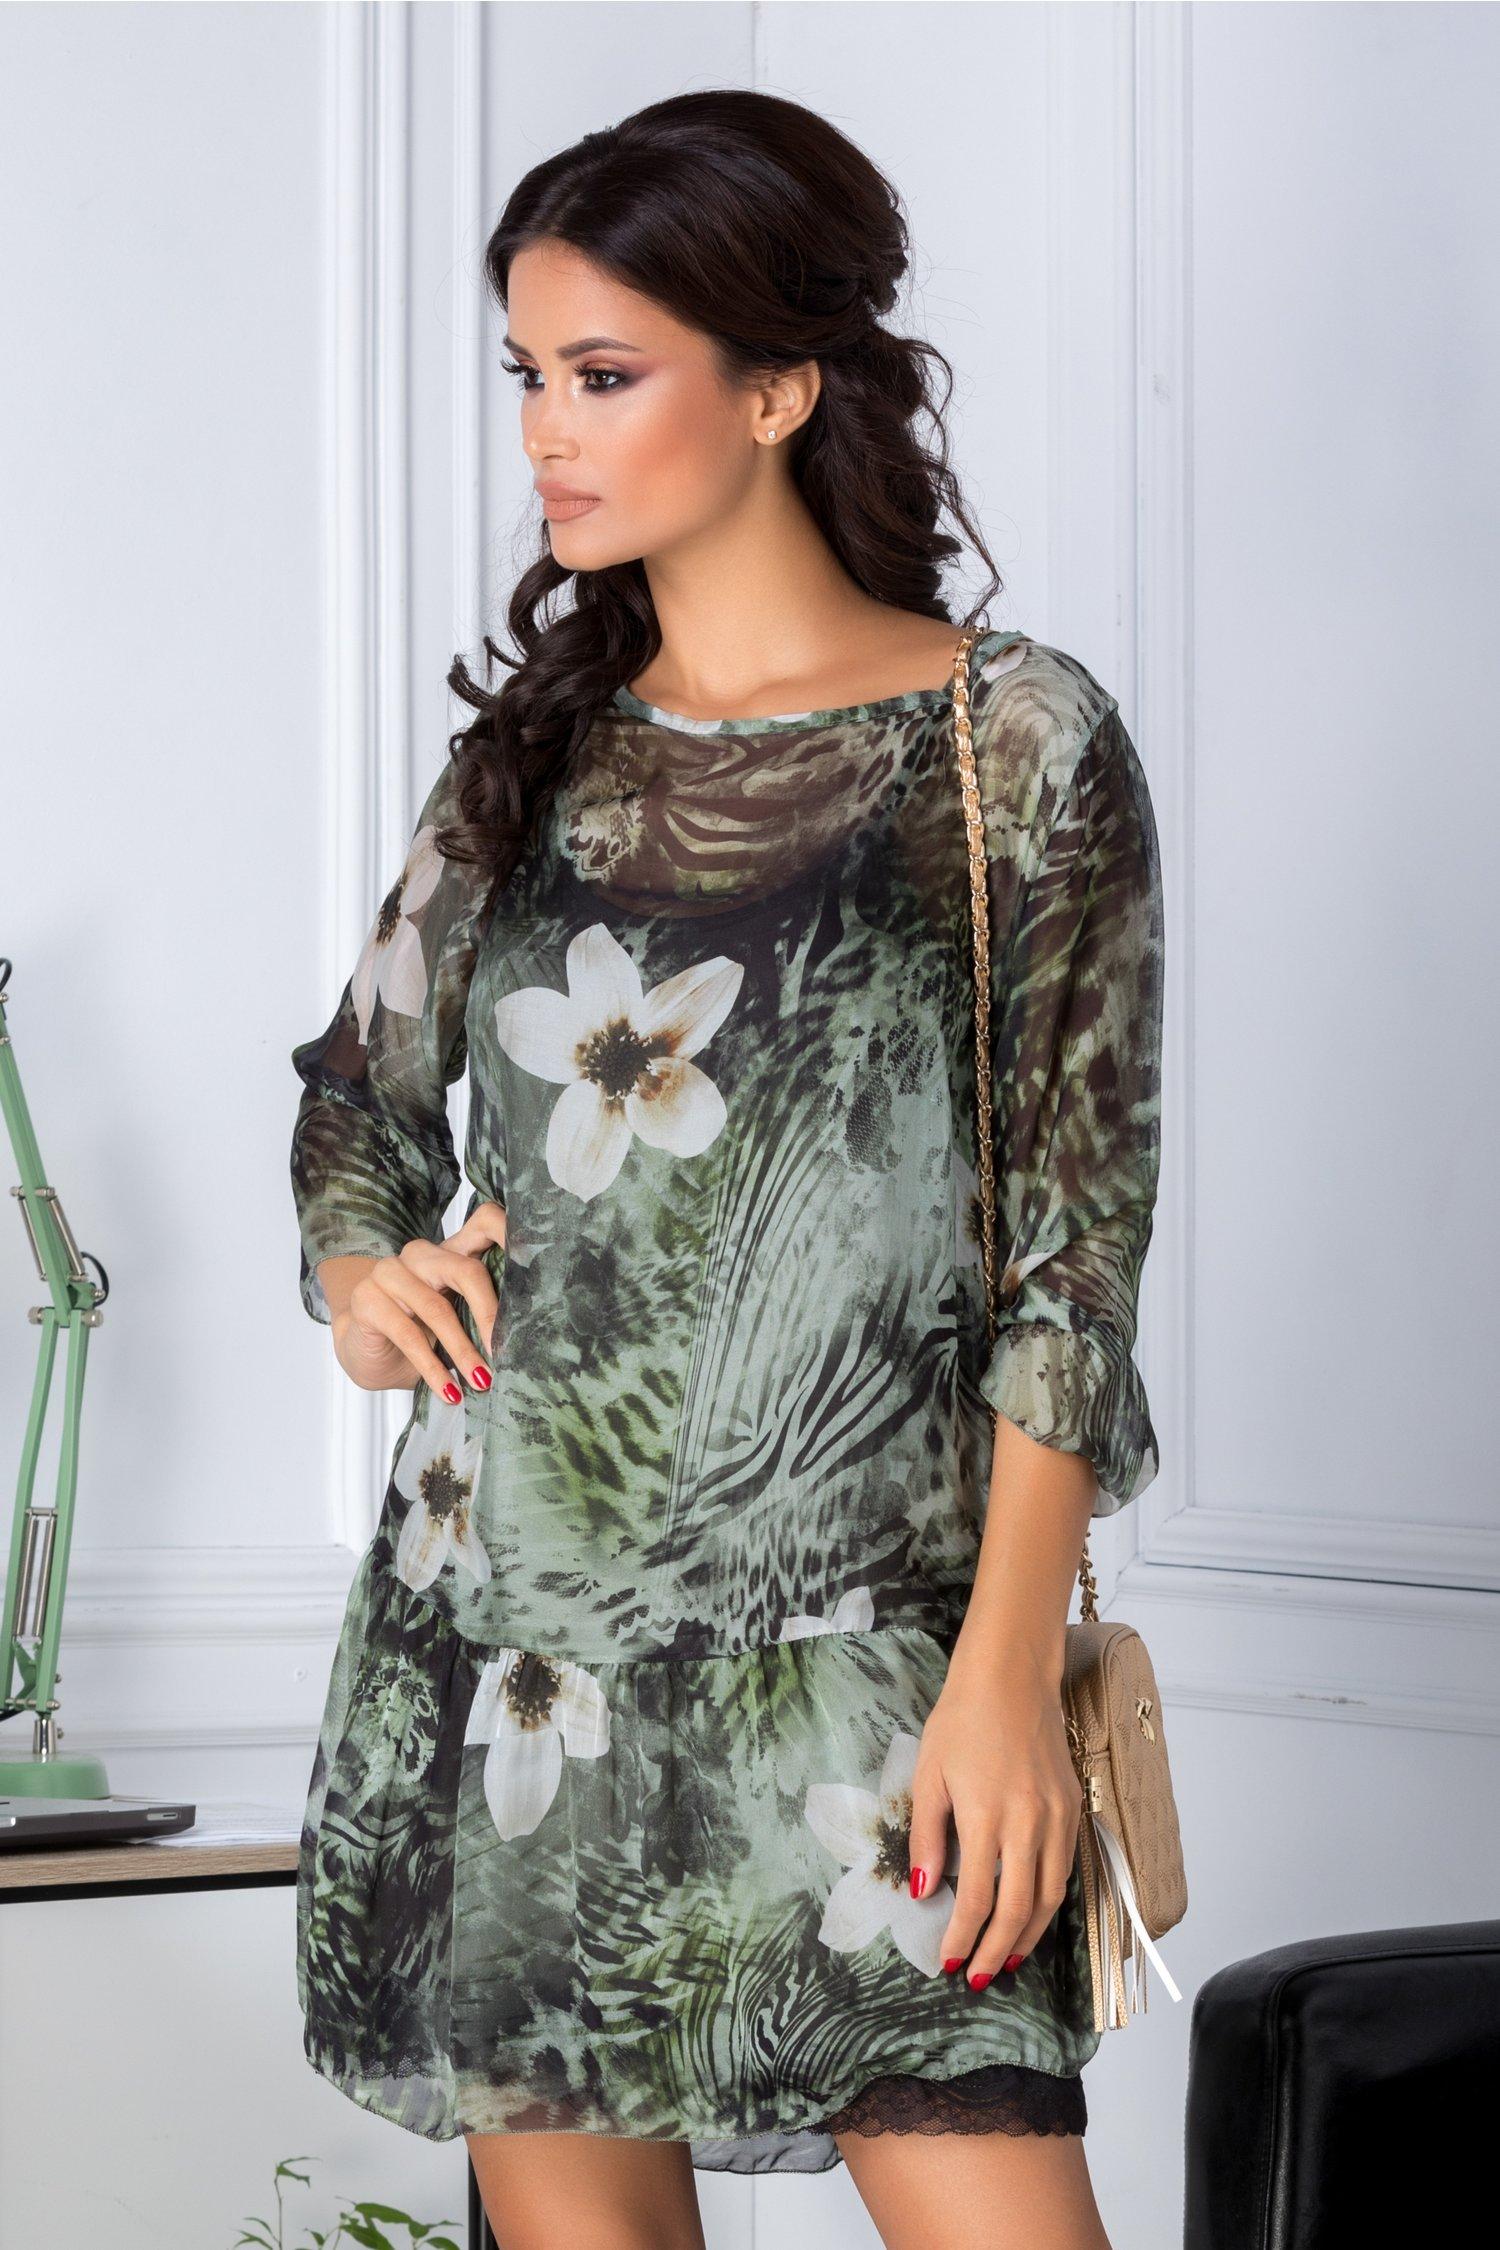 Rochie Tania verde vaporoasa cu imprimeu